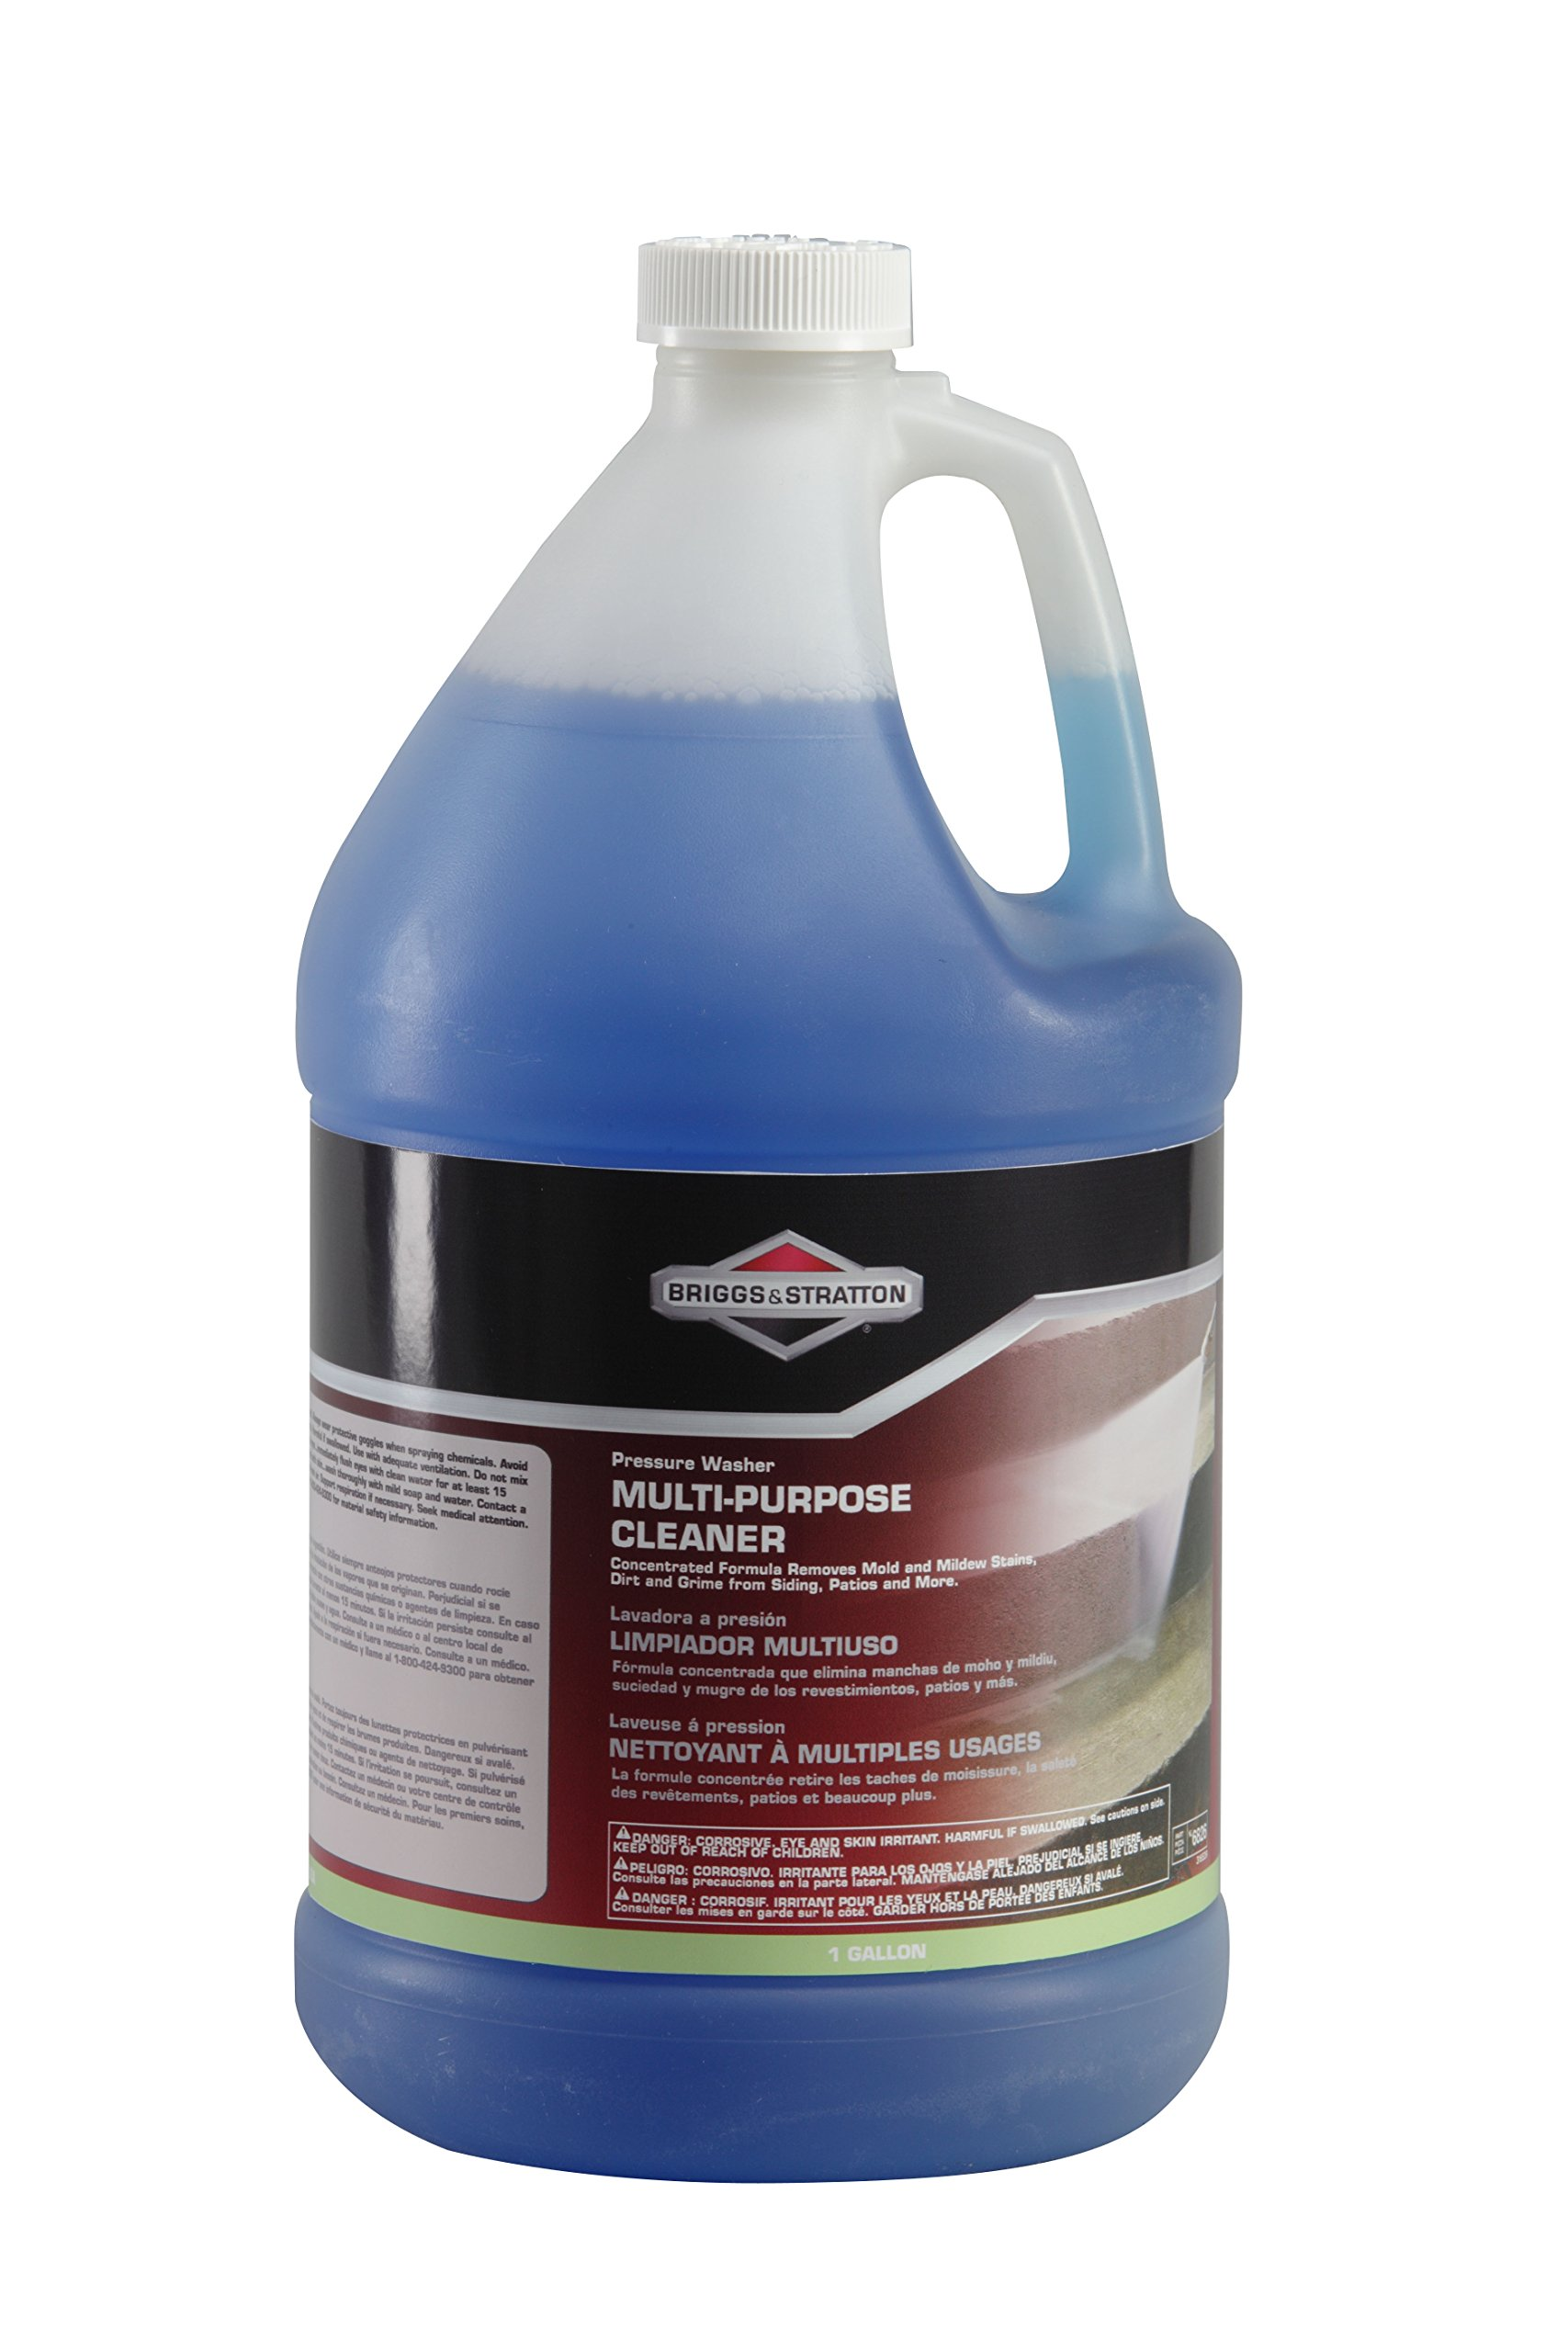 Briggs & Stratton 6826 Multi-Purpose Cleaner and Concentrate for Pressure Washers, 1-Gallon